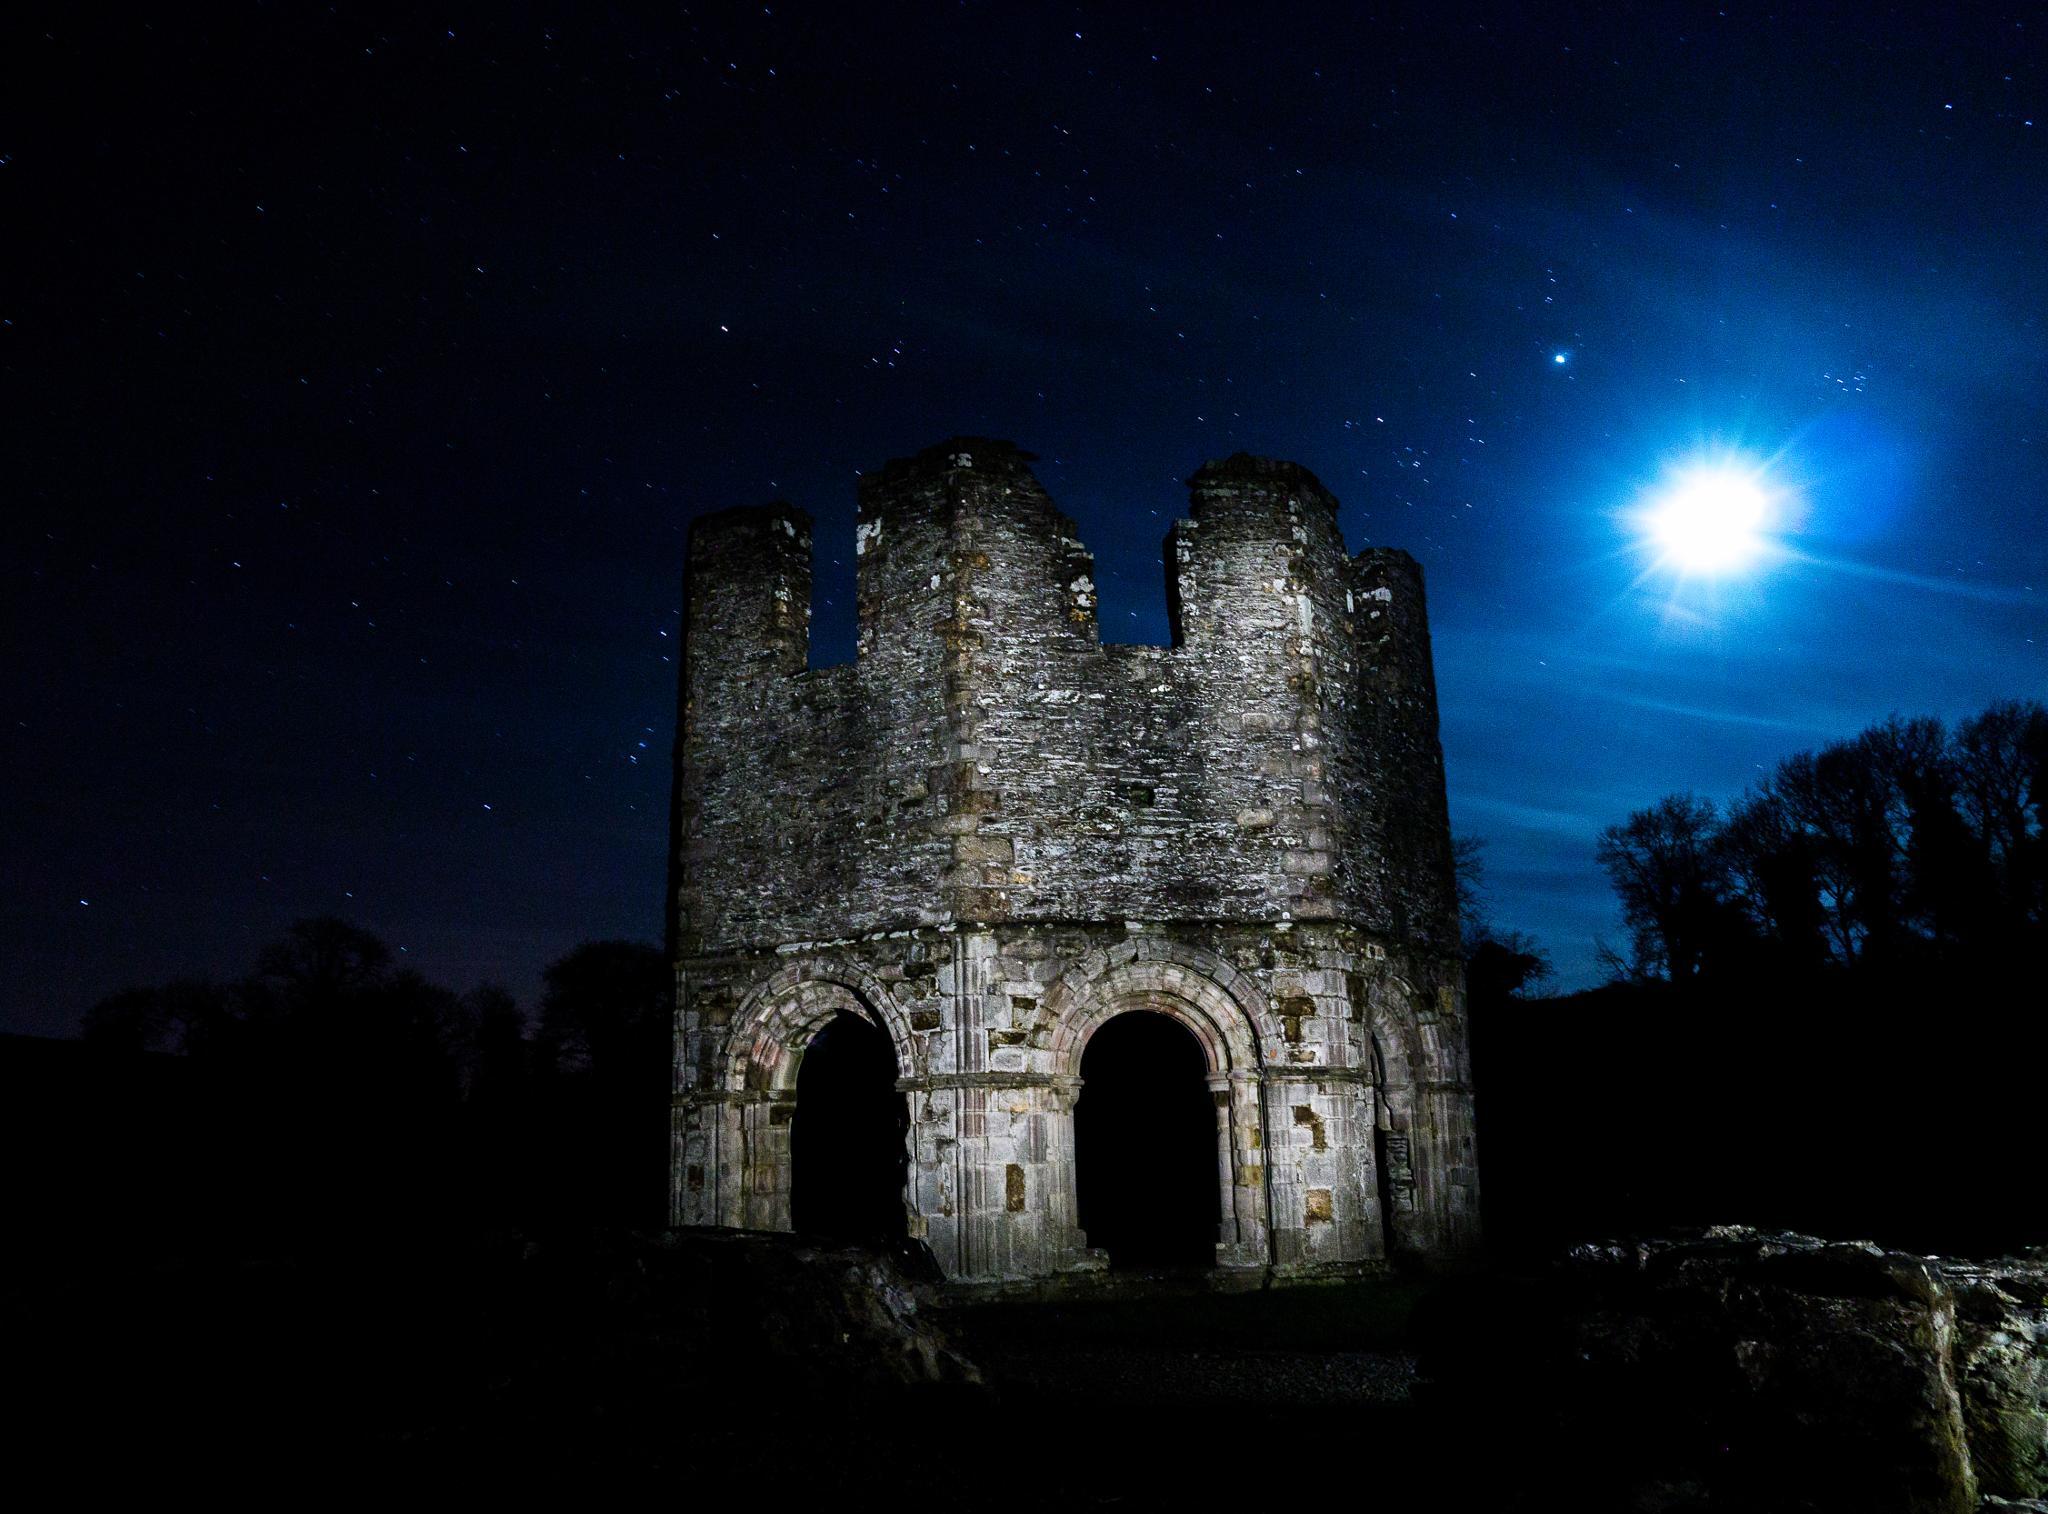 mellifont moon by Daryl O'Liathain